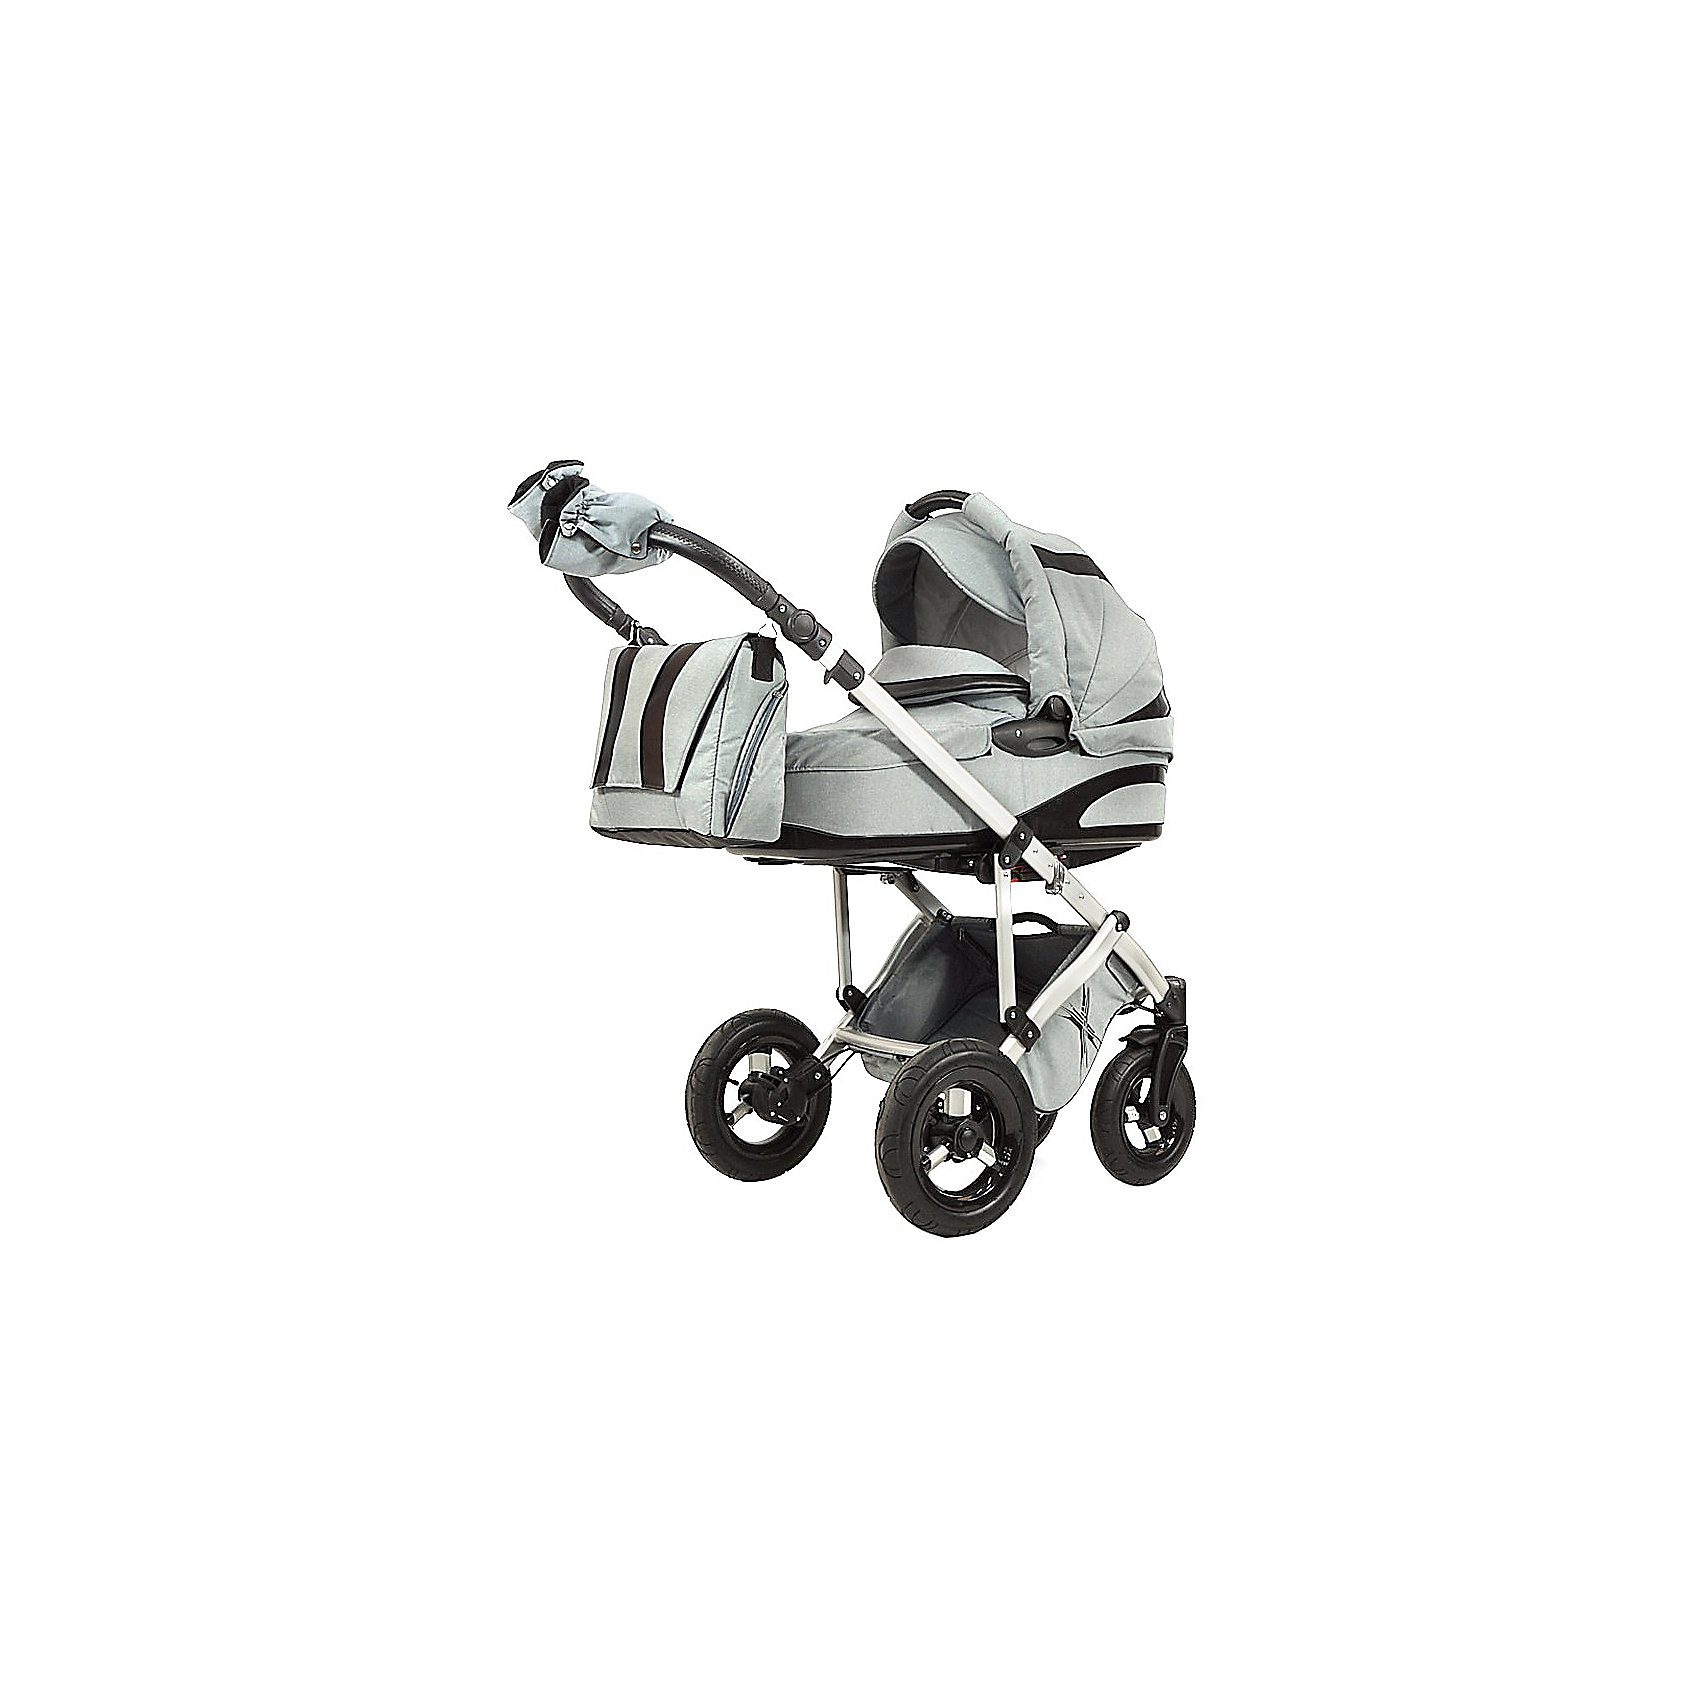 knorr-baby Kombi Kinderwagen NoXXter mit Wickeltasche, grau